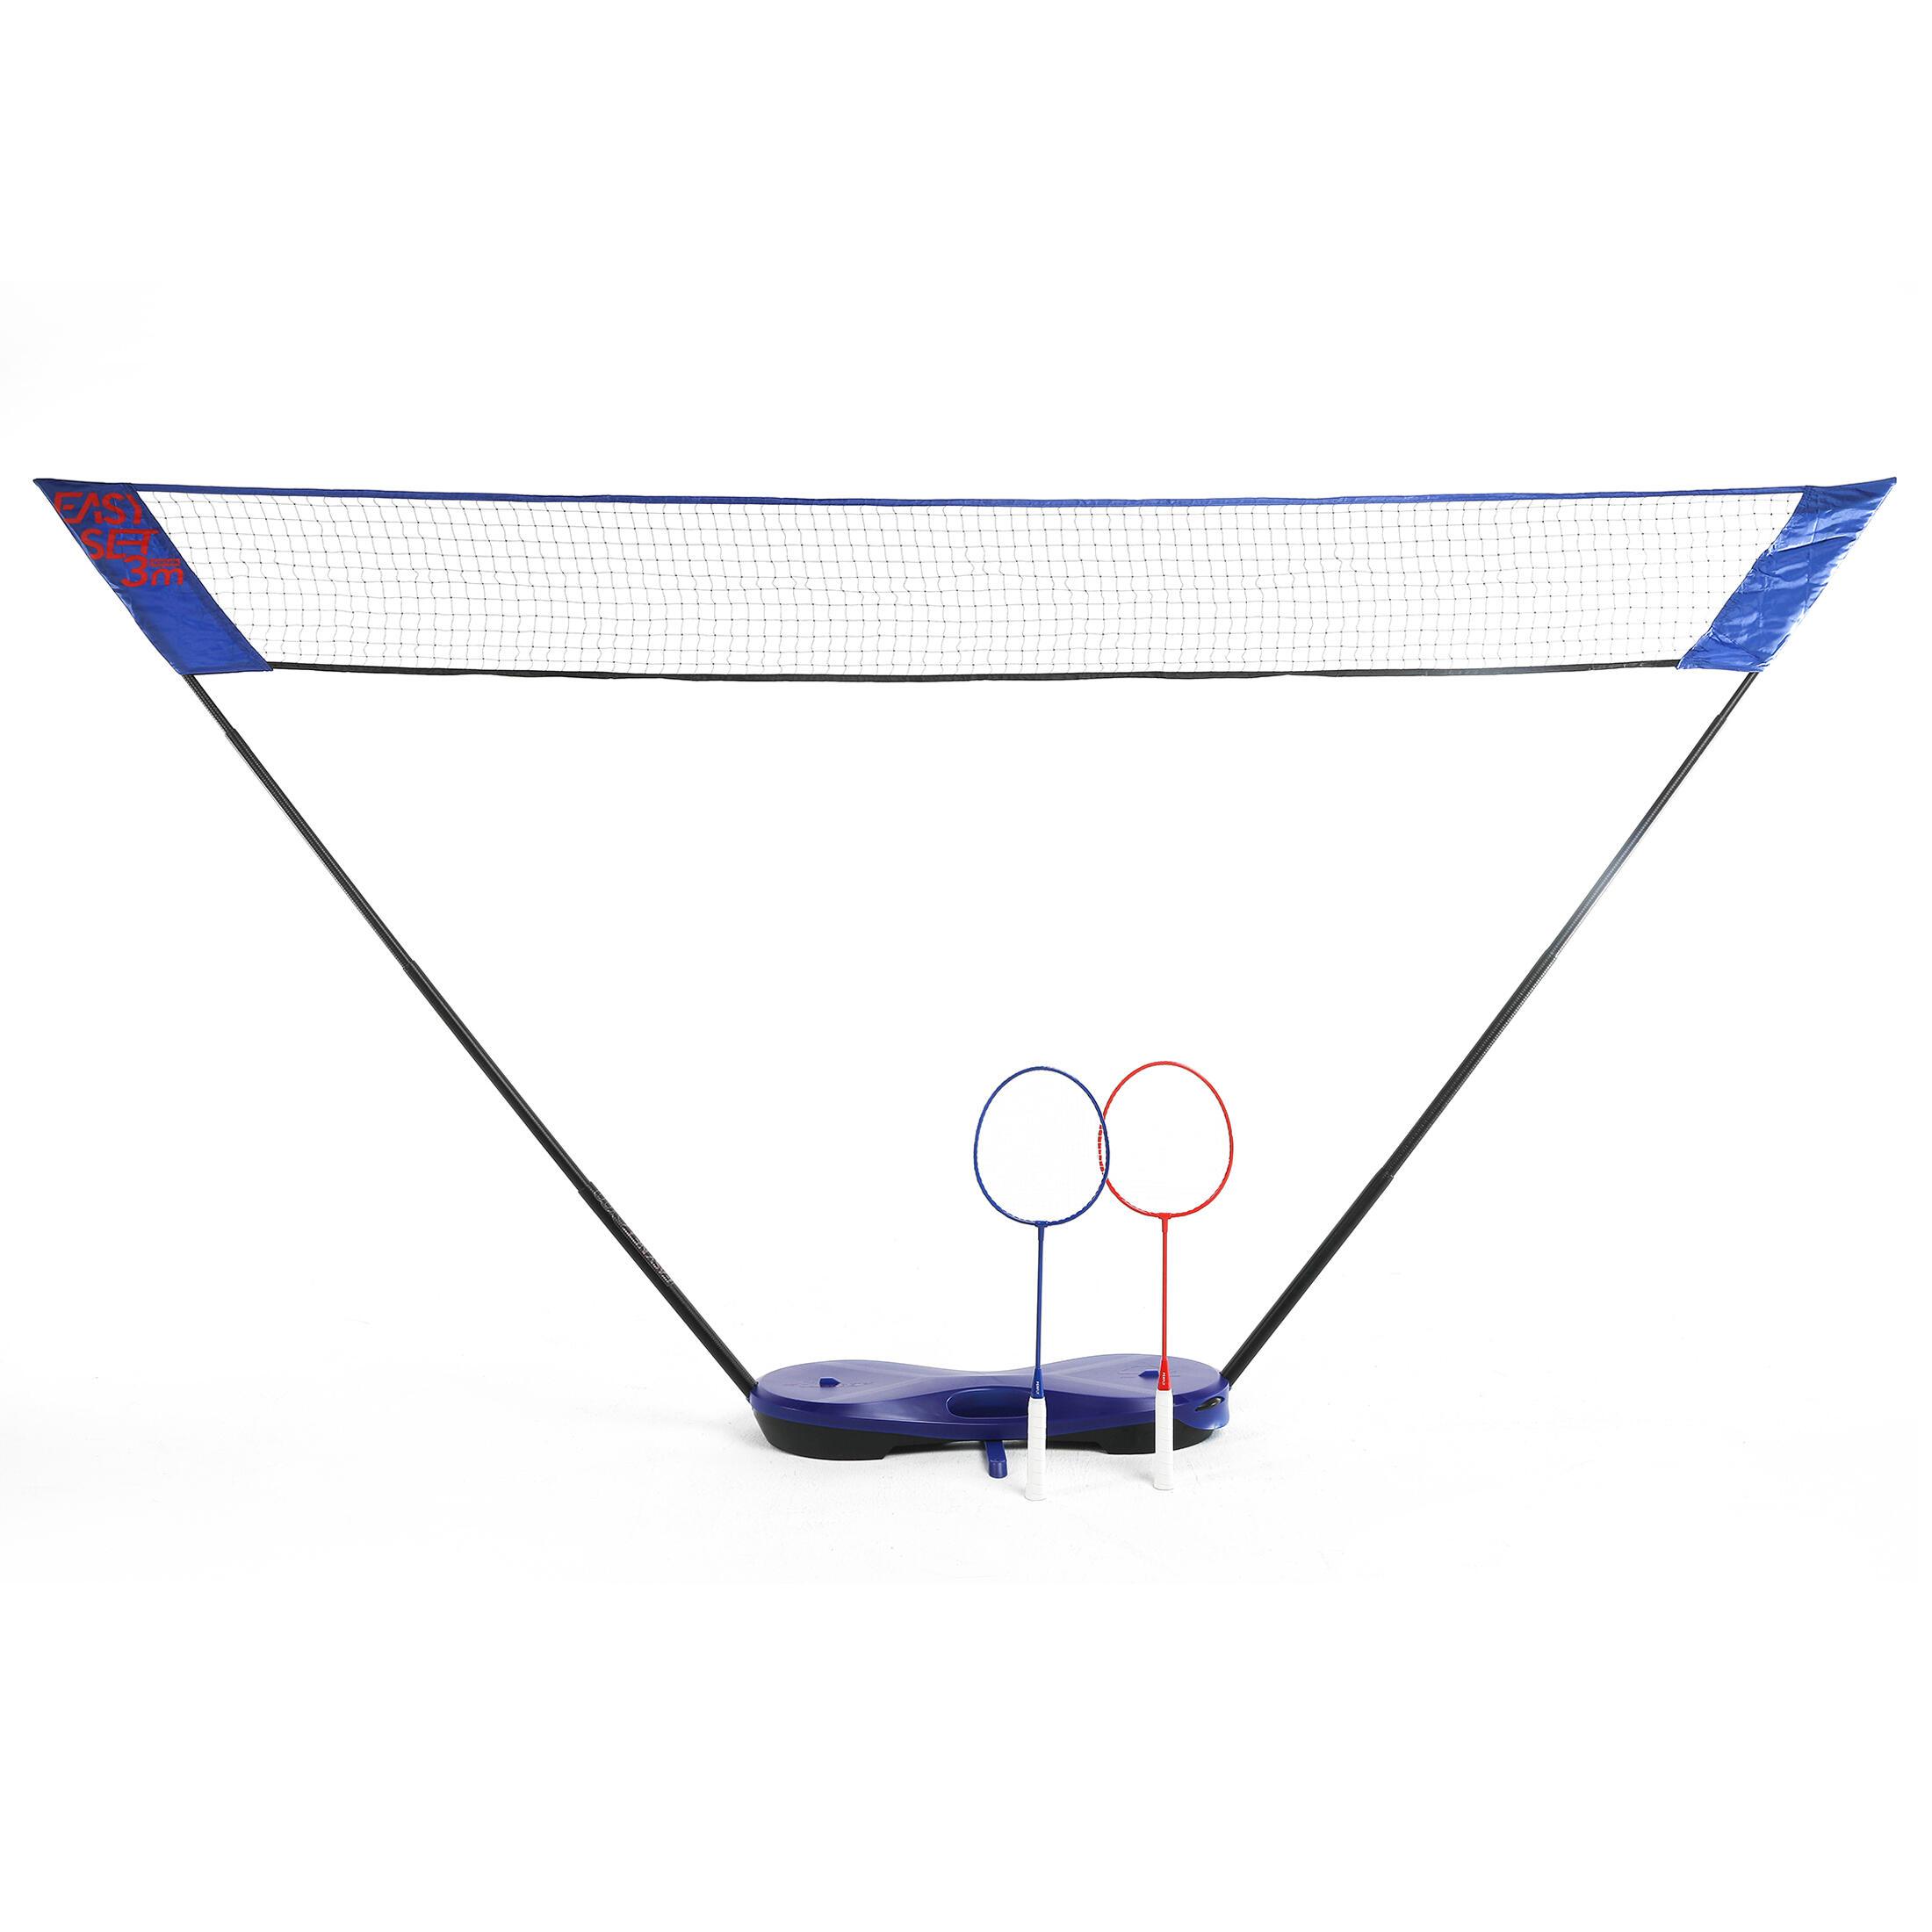 PERFLY Kit badminton EASY NET 3m azzurro